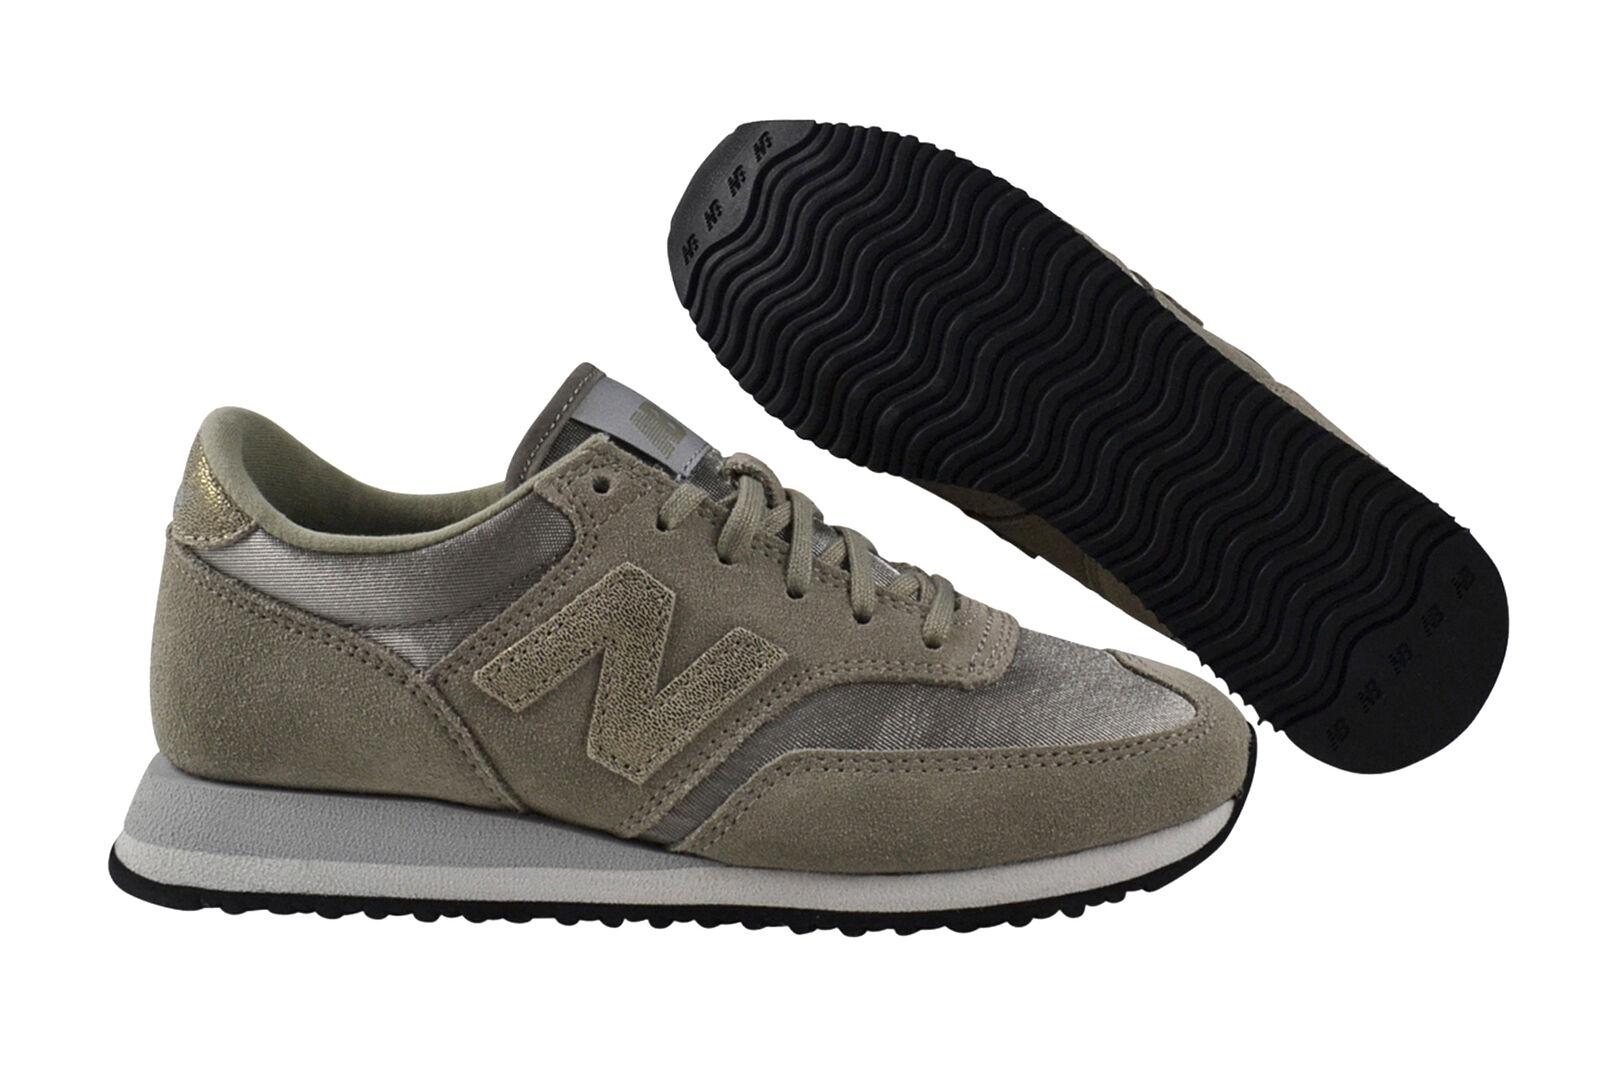 New Balance CW620 FMB khaki khaki FMB  zapatos  Sneaker grau f2efdd